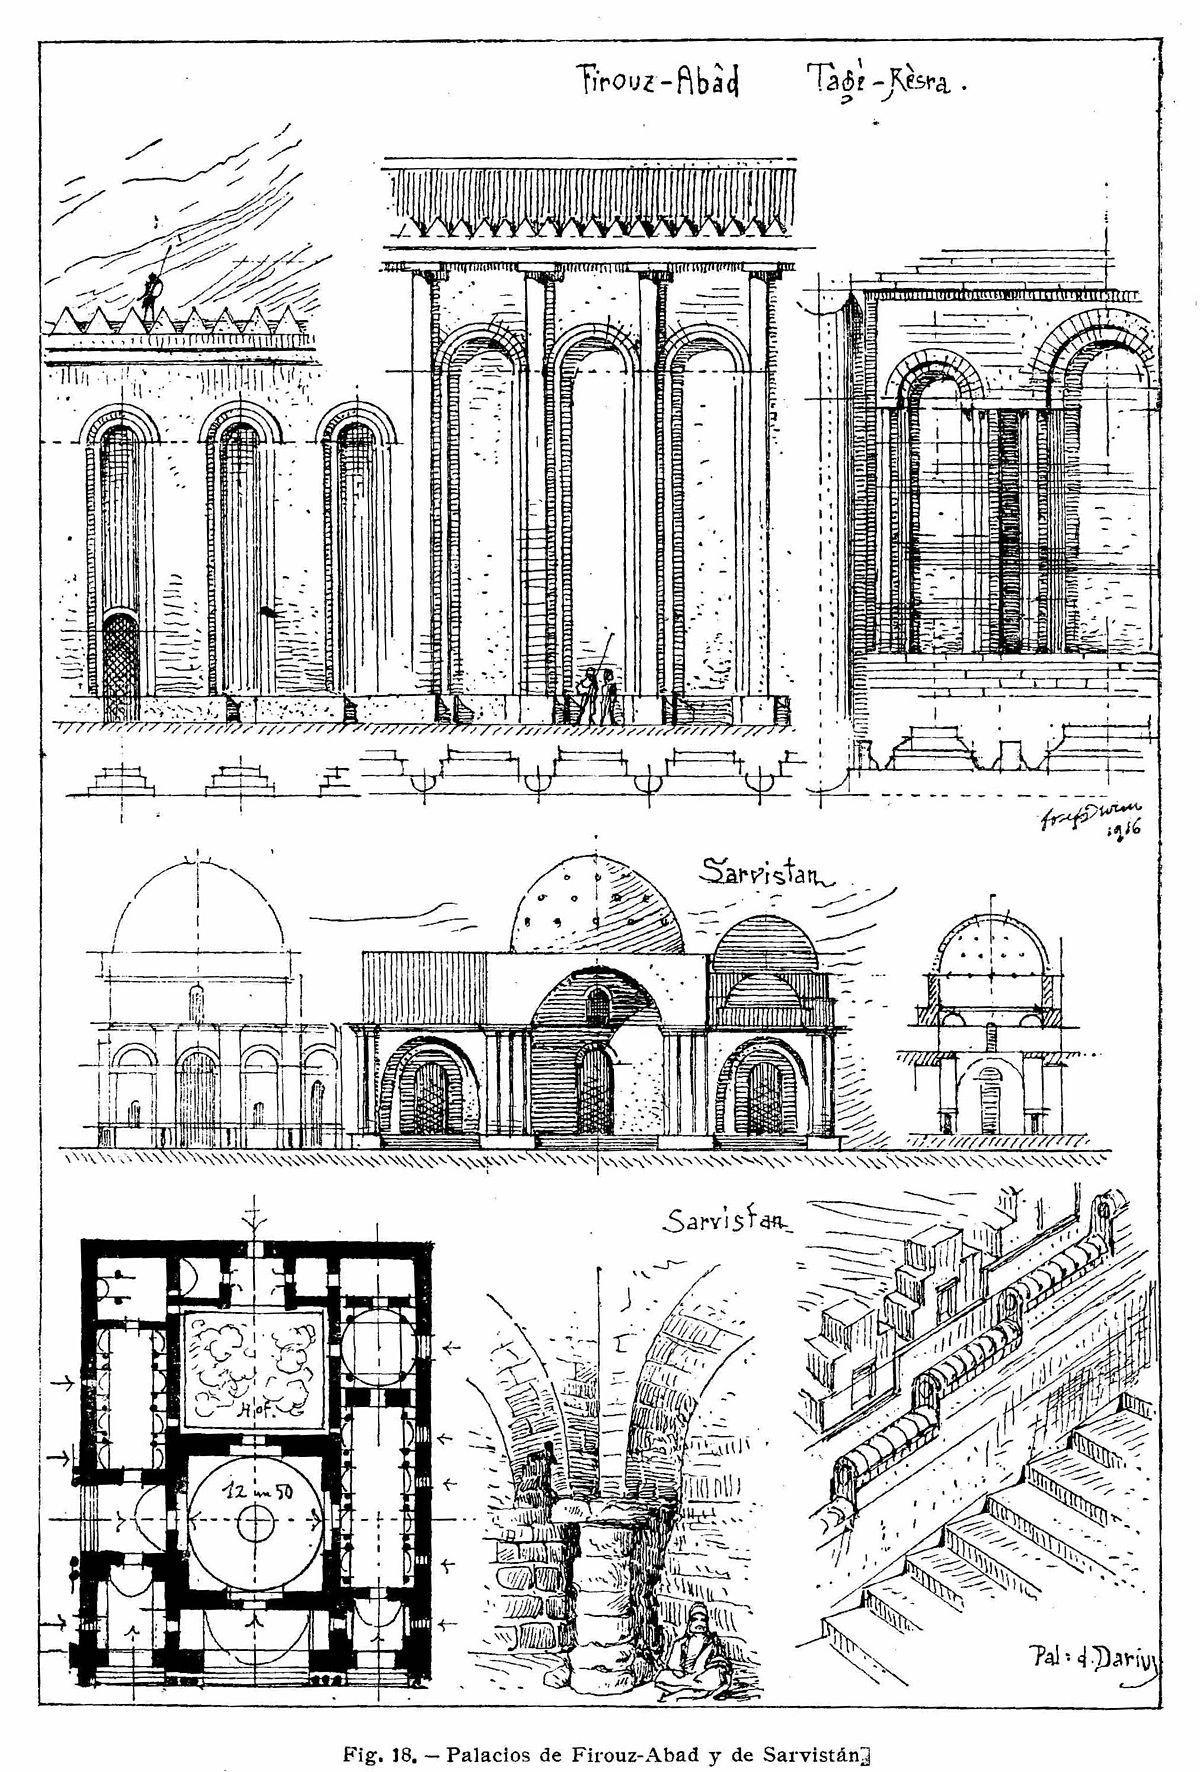 Dise o arquitect nico wikipedia la enciclopedia libre for Pie de plano arquitectonico pdf